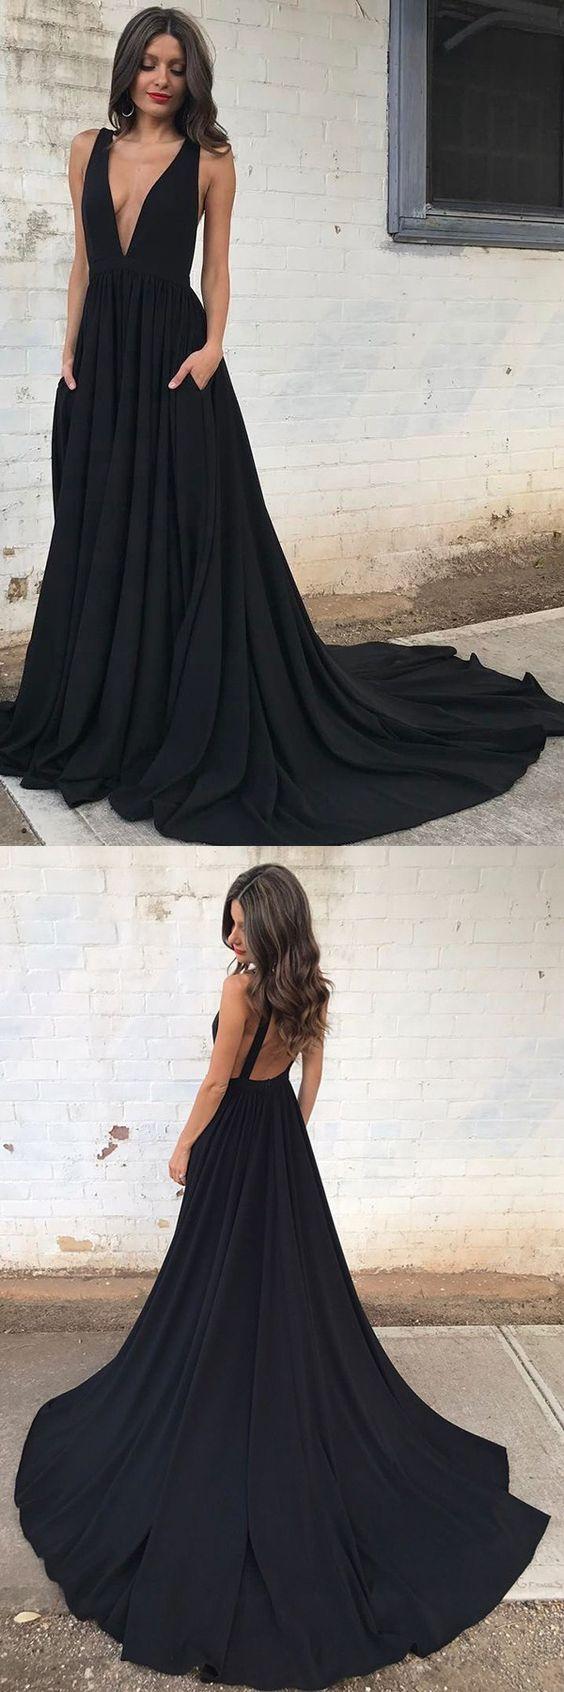 Hem Prom Dresses Gown Evening Dresses Deep V Neck Evening Dresses Sheer Back Evening Dresses